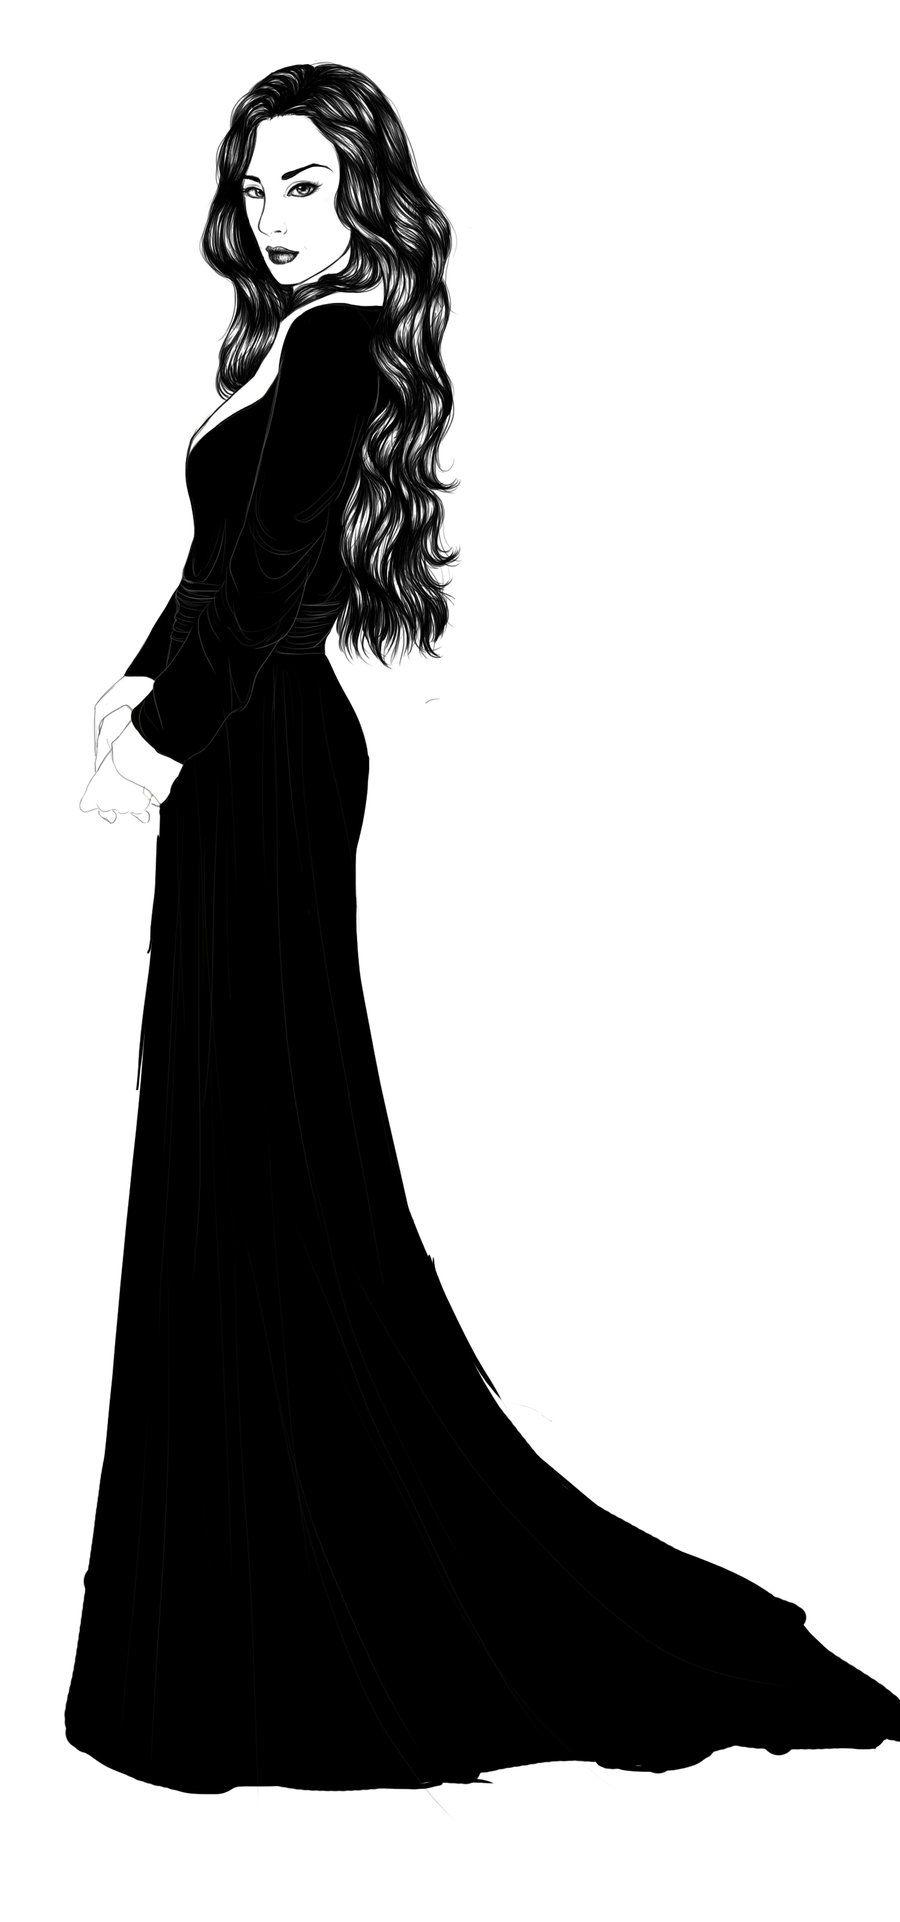 Melisande Shahrizai By Livskaiantart On @deviantart